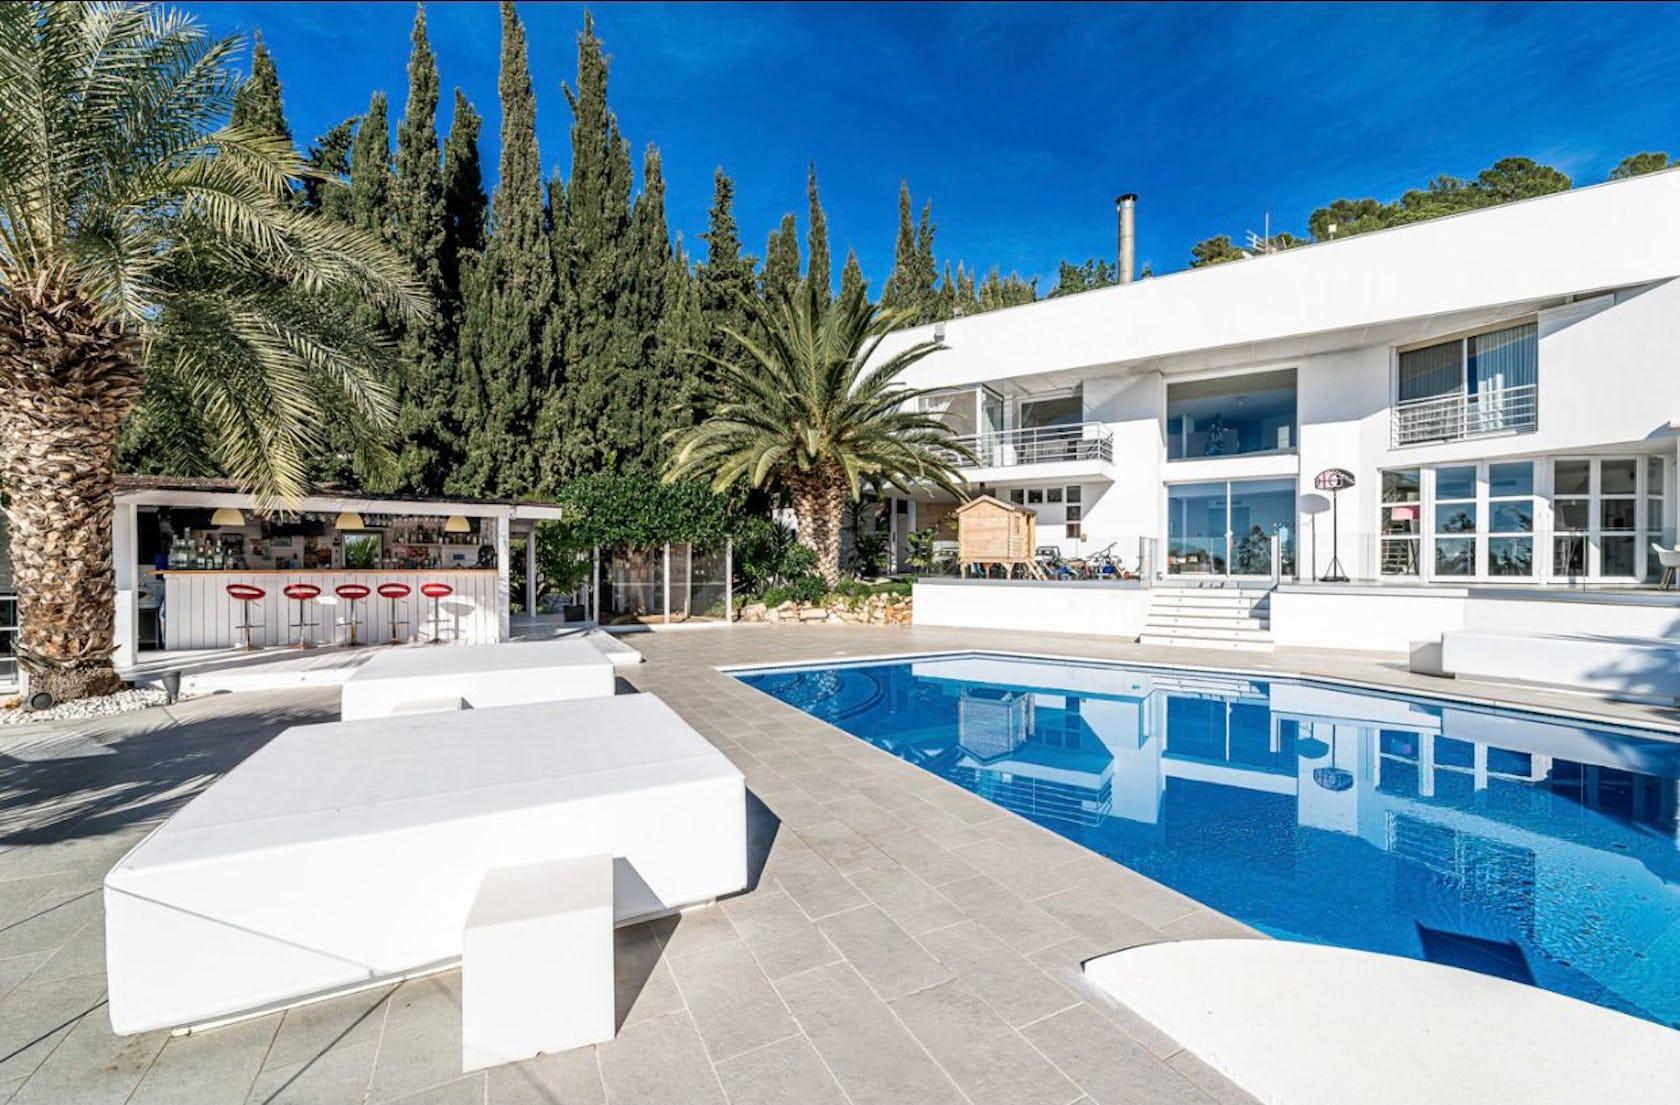 villa housing building house pool water